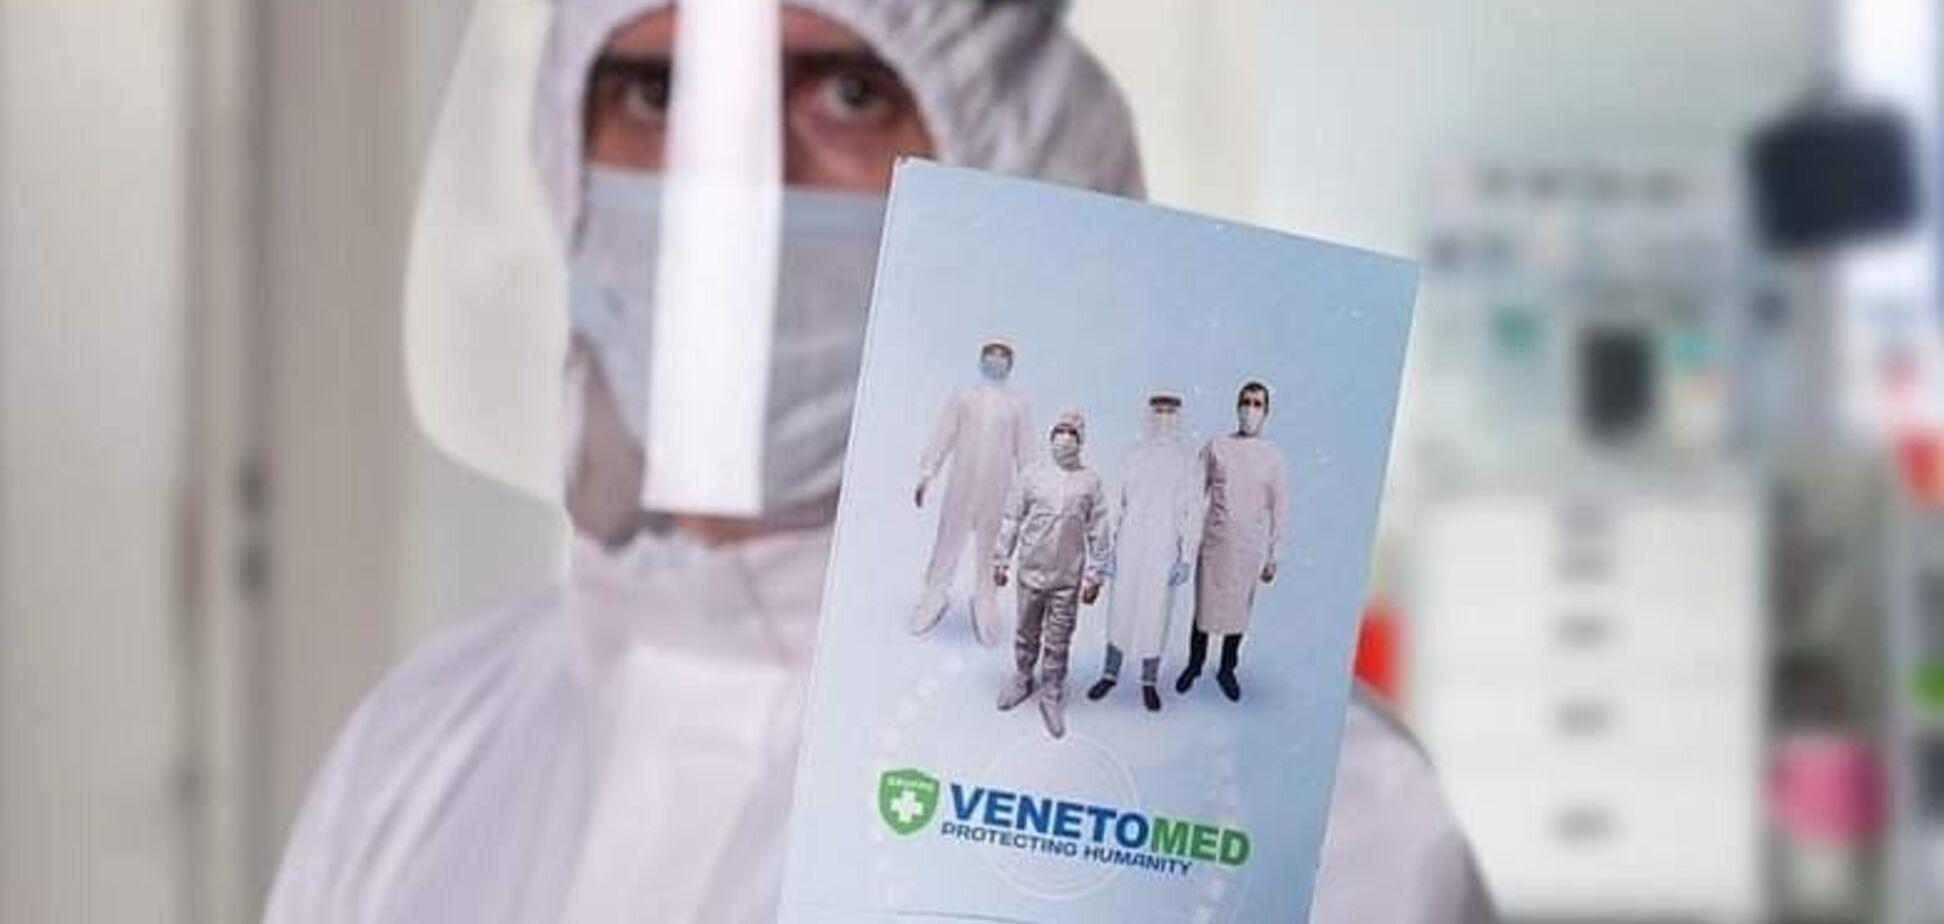 Група Венето представить на Public Health 2021 вироби медичного призначення VENETOMED